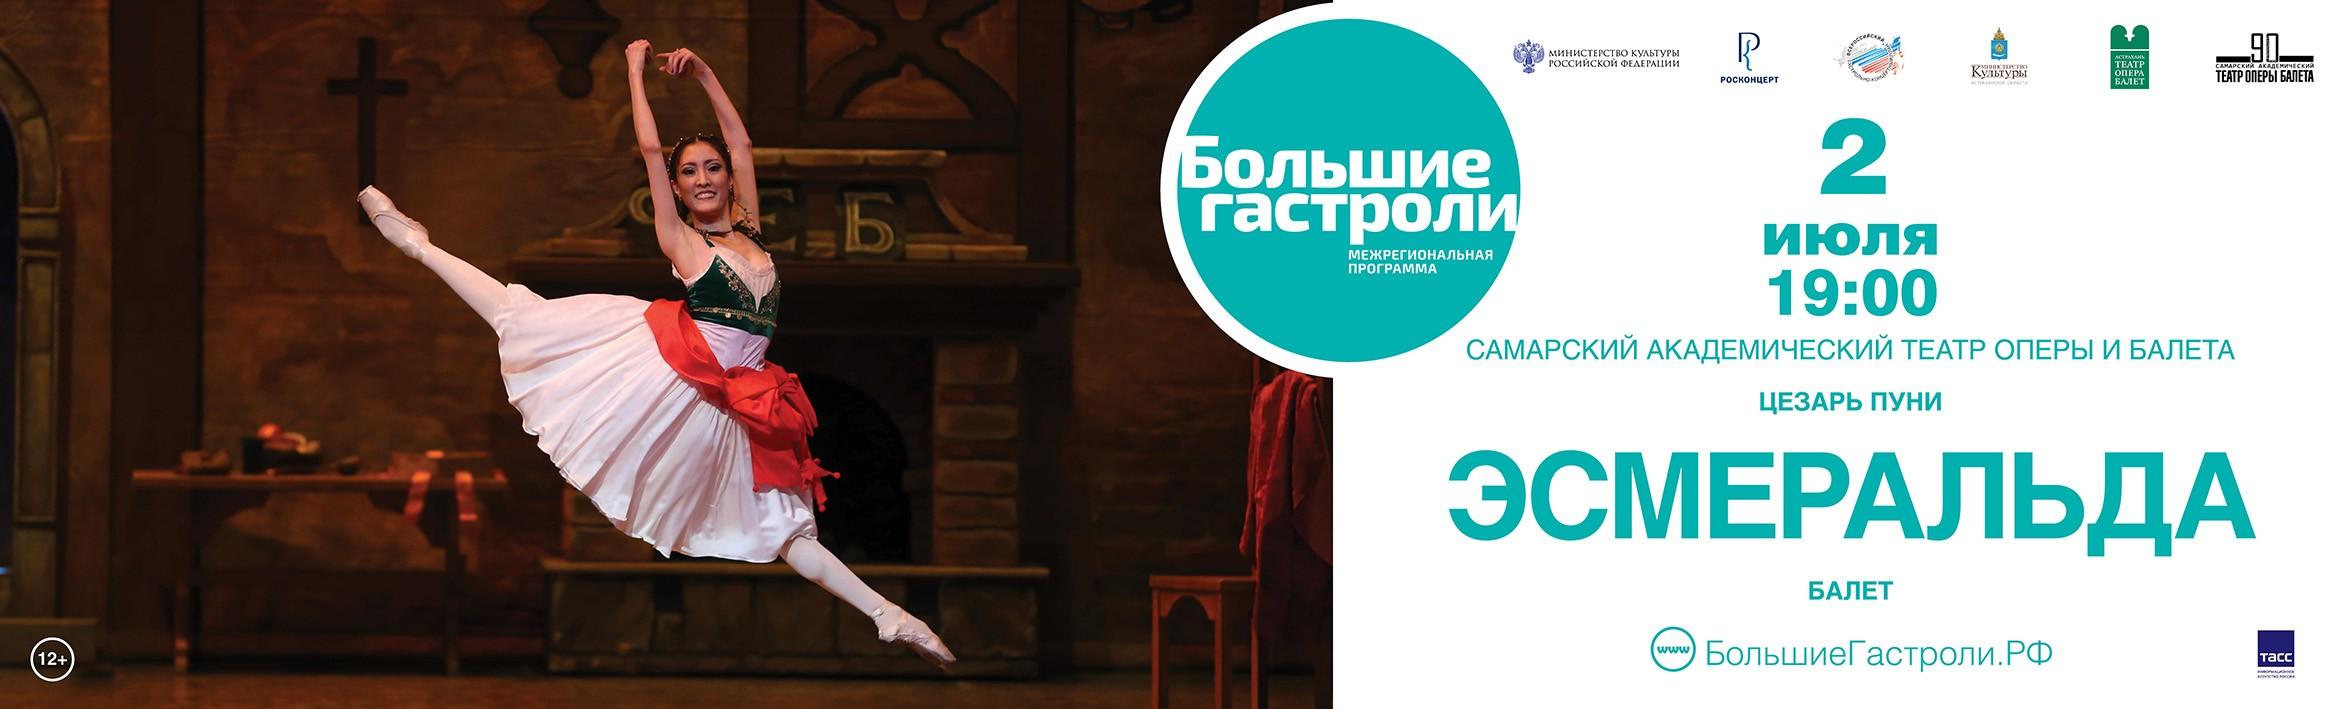 Балет «Эсмеральда». Самарский театр оперы и балета